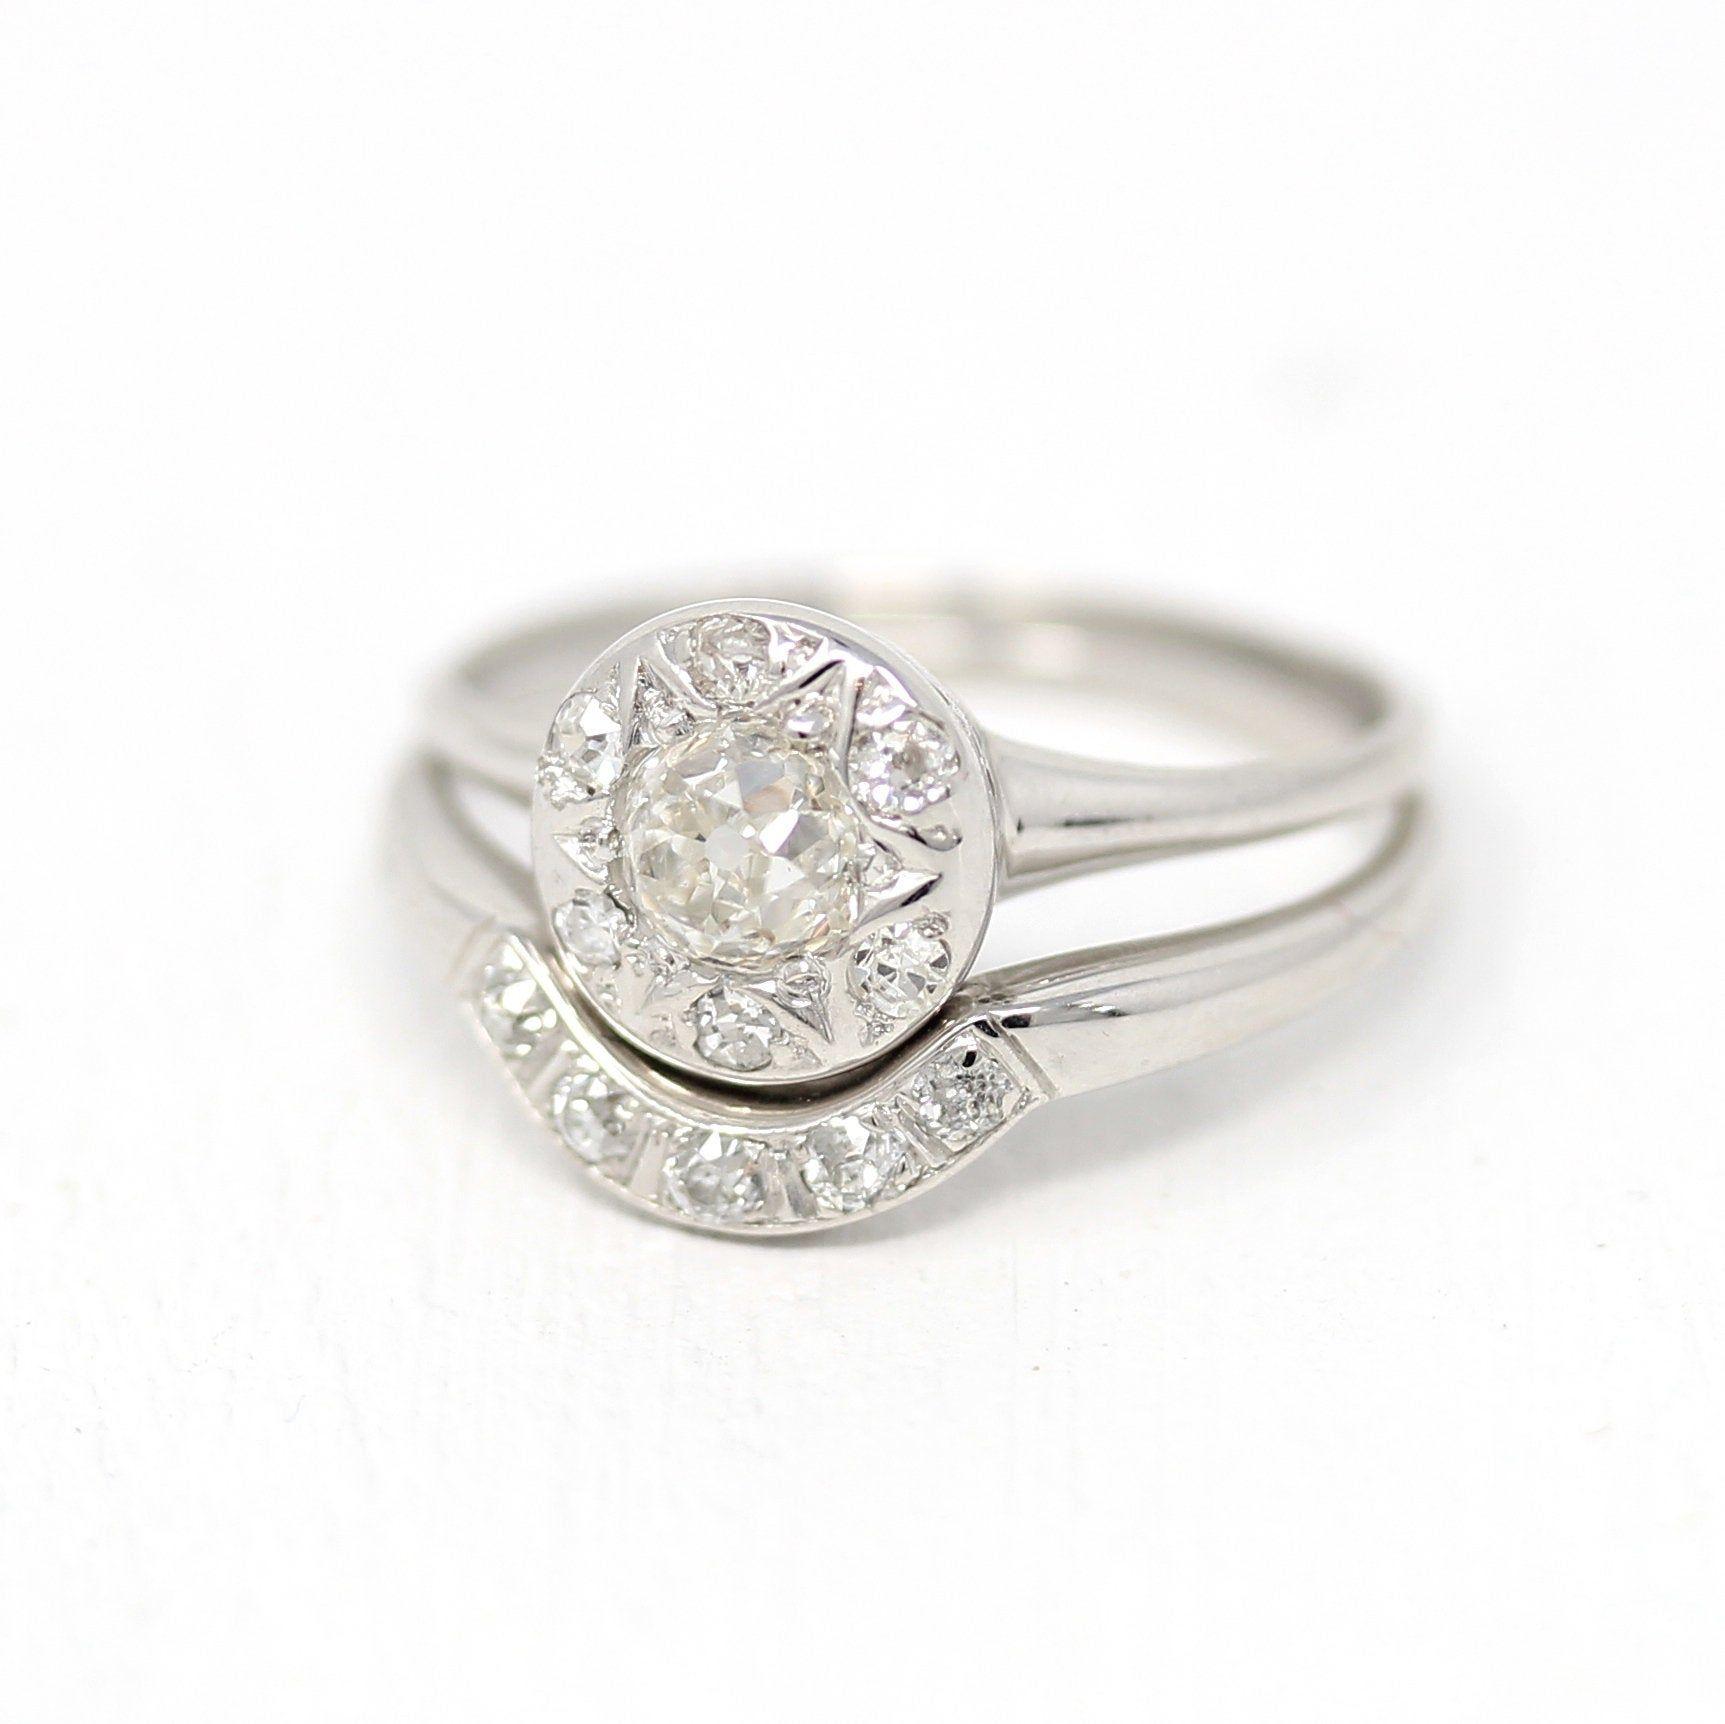 Vintage Wedding Ring Set 18k White Gold .83 CTW Diamond